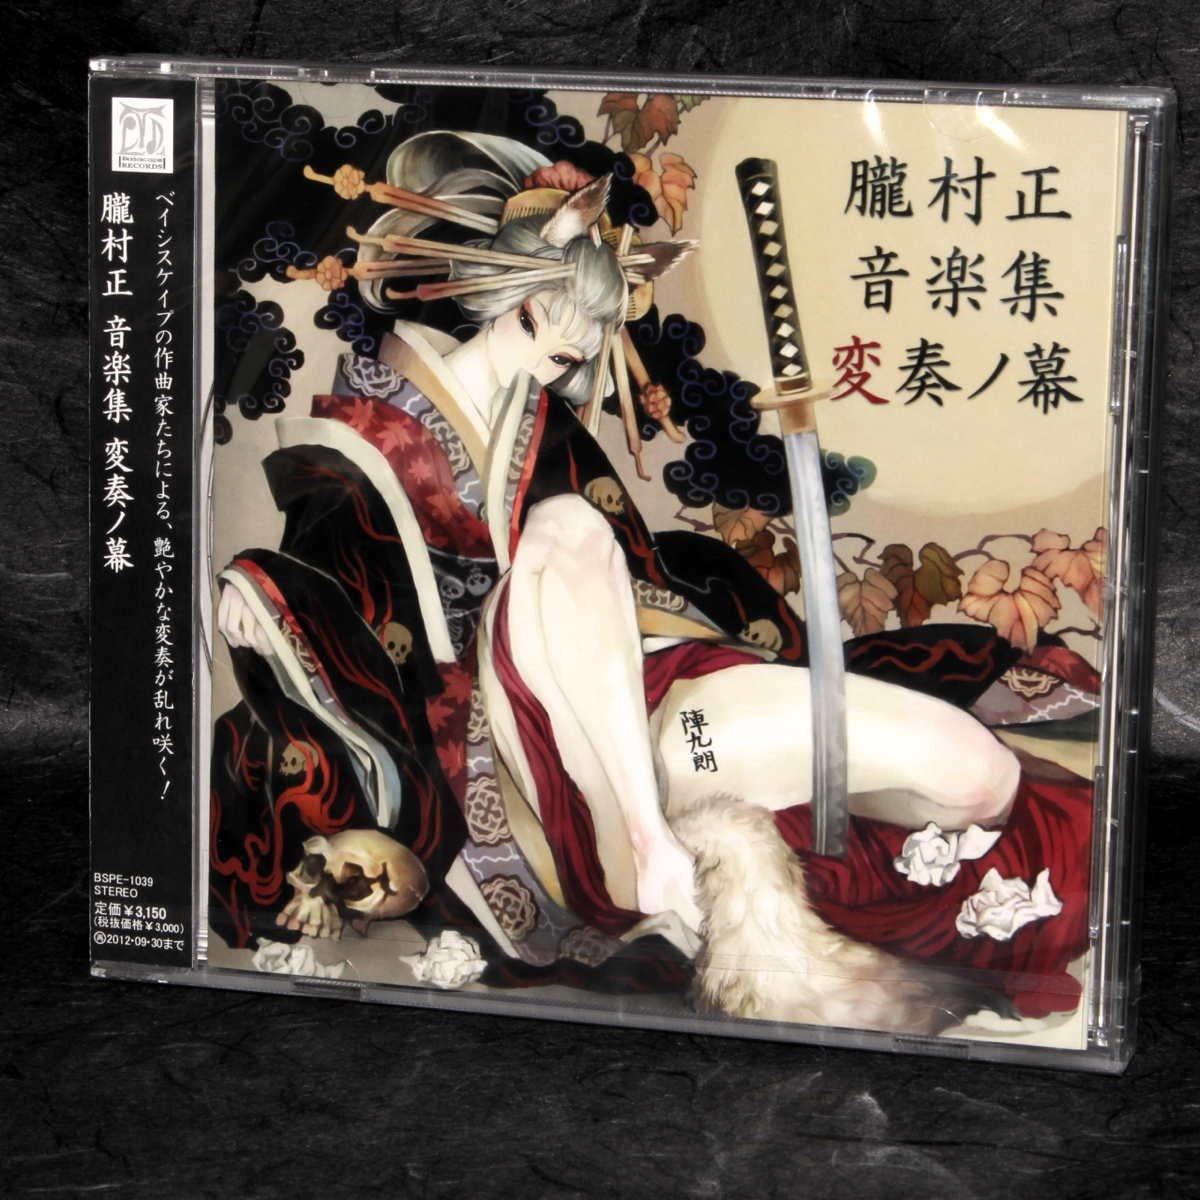 Muramasa The Demon Blade Arrange Version Japan Wii Game Music CD NEW